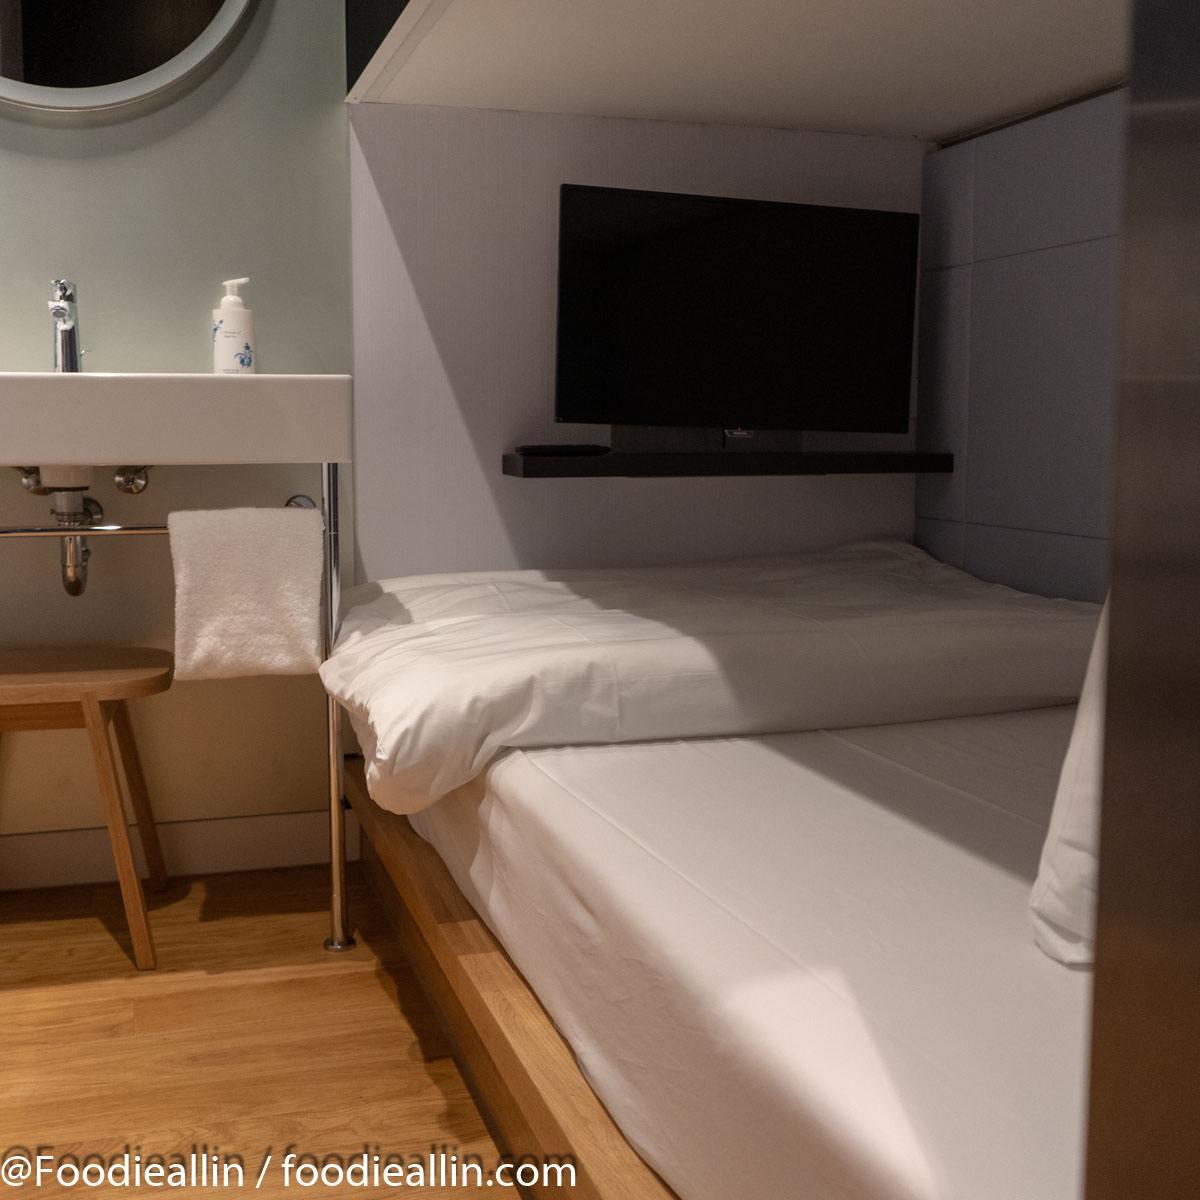 klm-crown-lounge-amsterdam-1-14